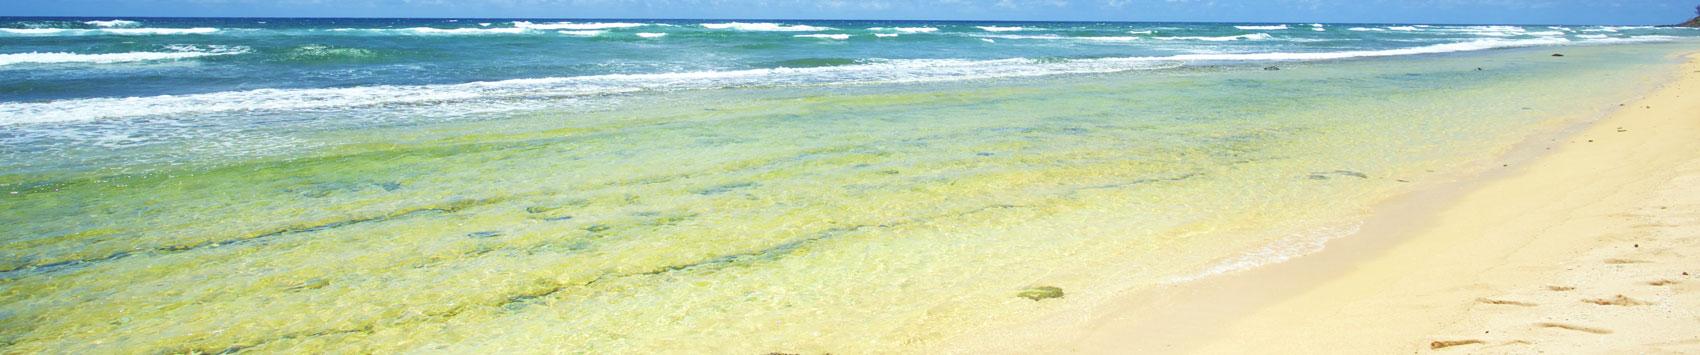 Kauai Hotels and Travel Guide | Aqua-Aston Hotels